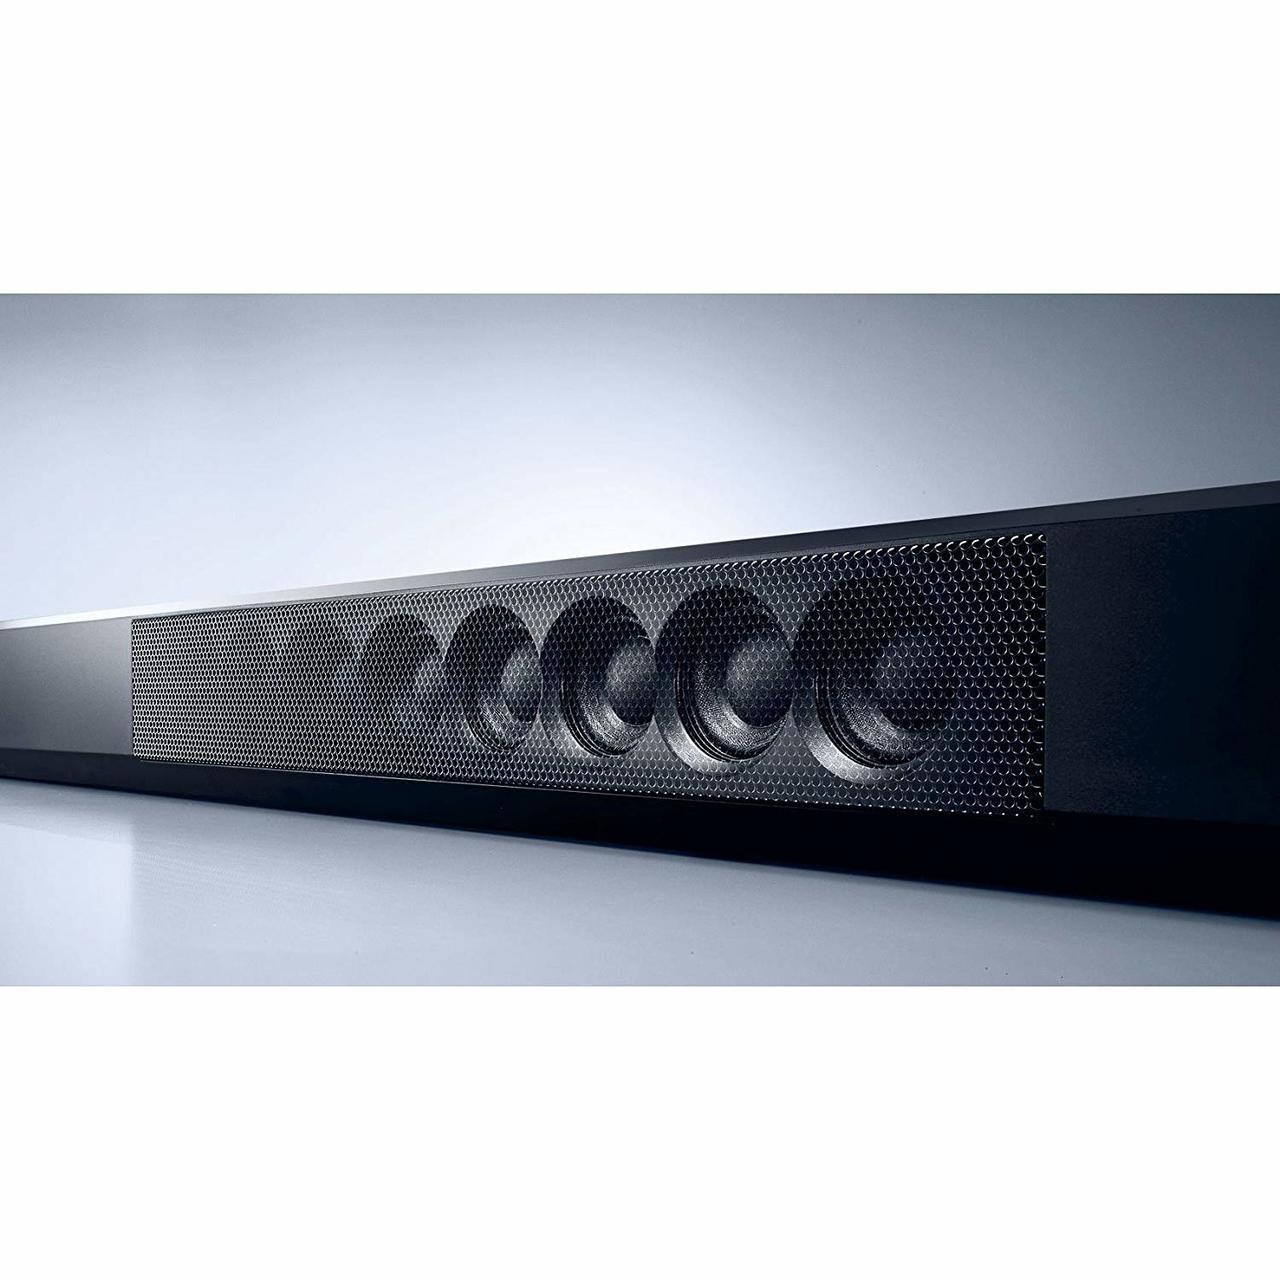 Yamaha YSP-1600BL-R MusicCast Sound Bar, Works with Alexa - Certified Refurbished